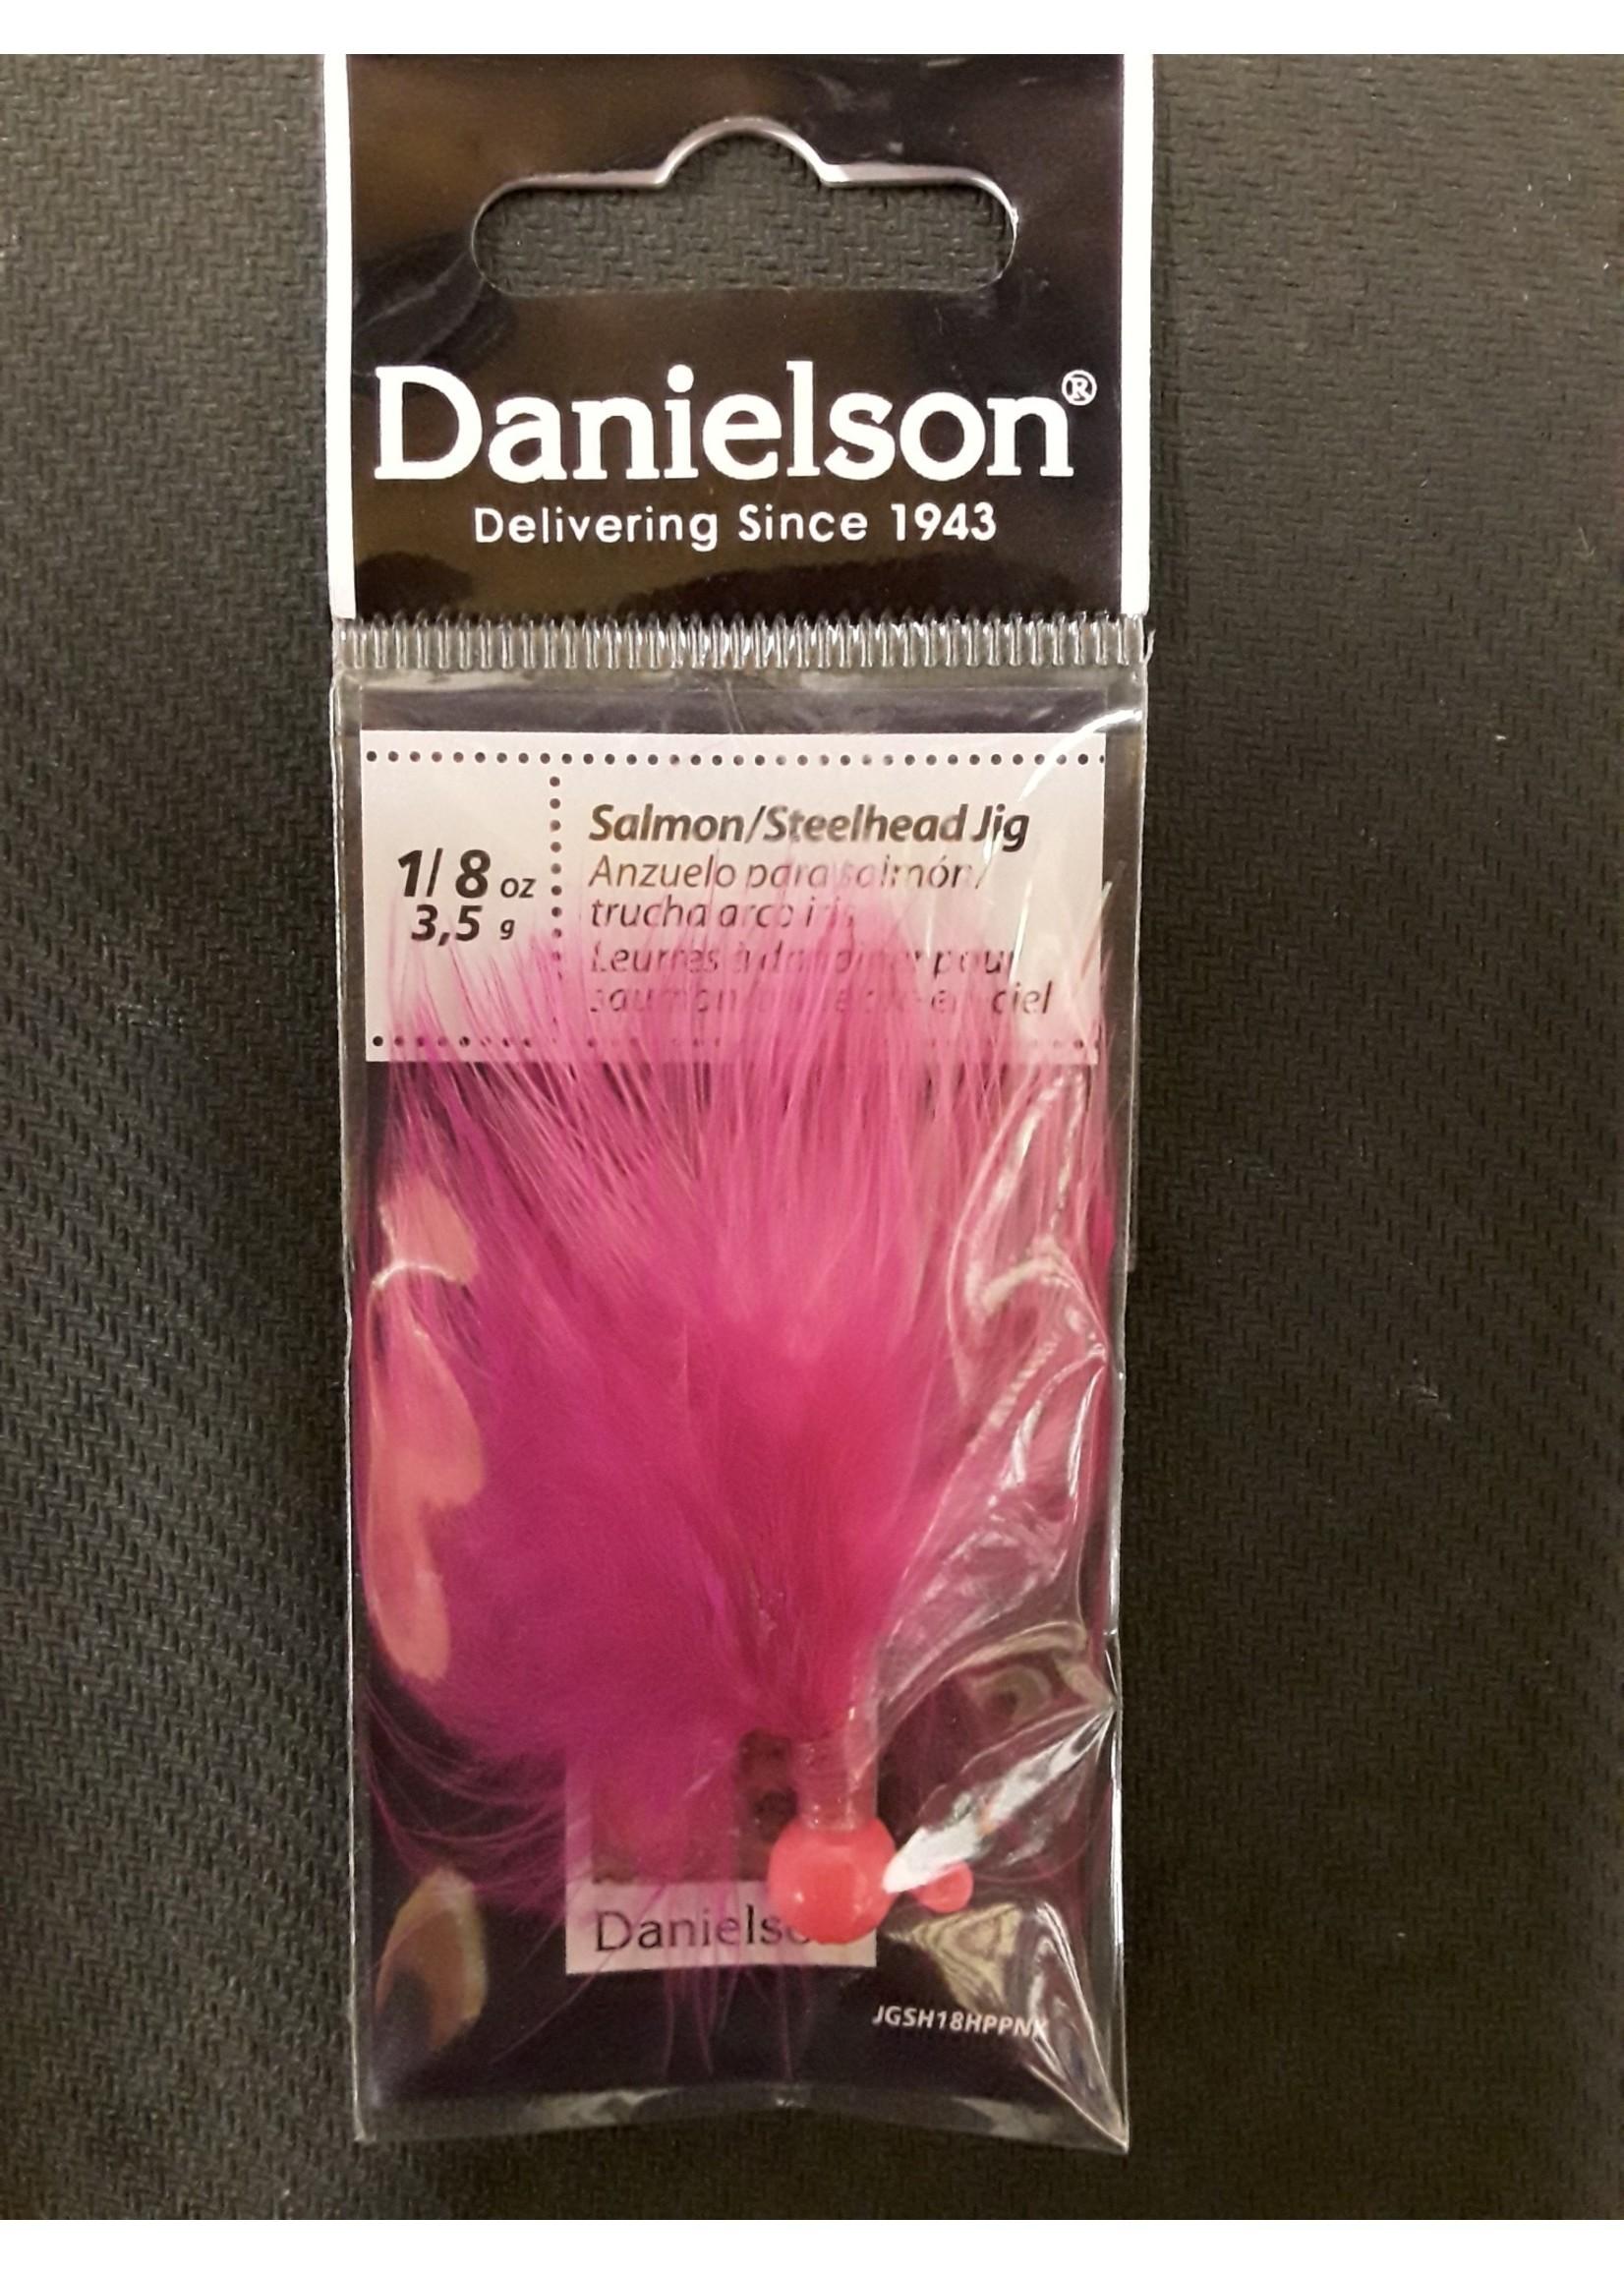 Danielson Danielson JIG STEELHEAD 1/8 oz